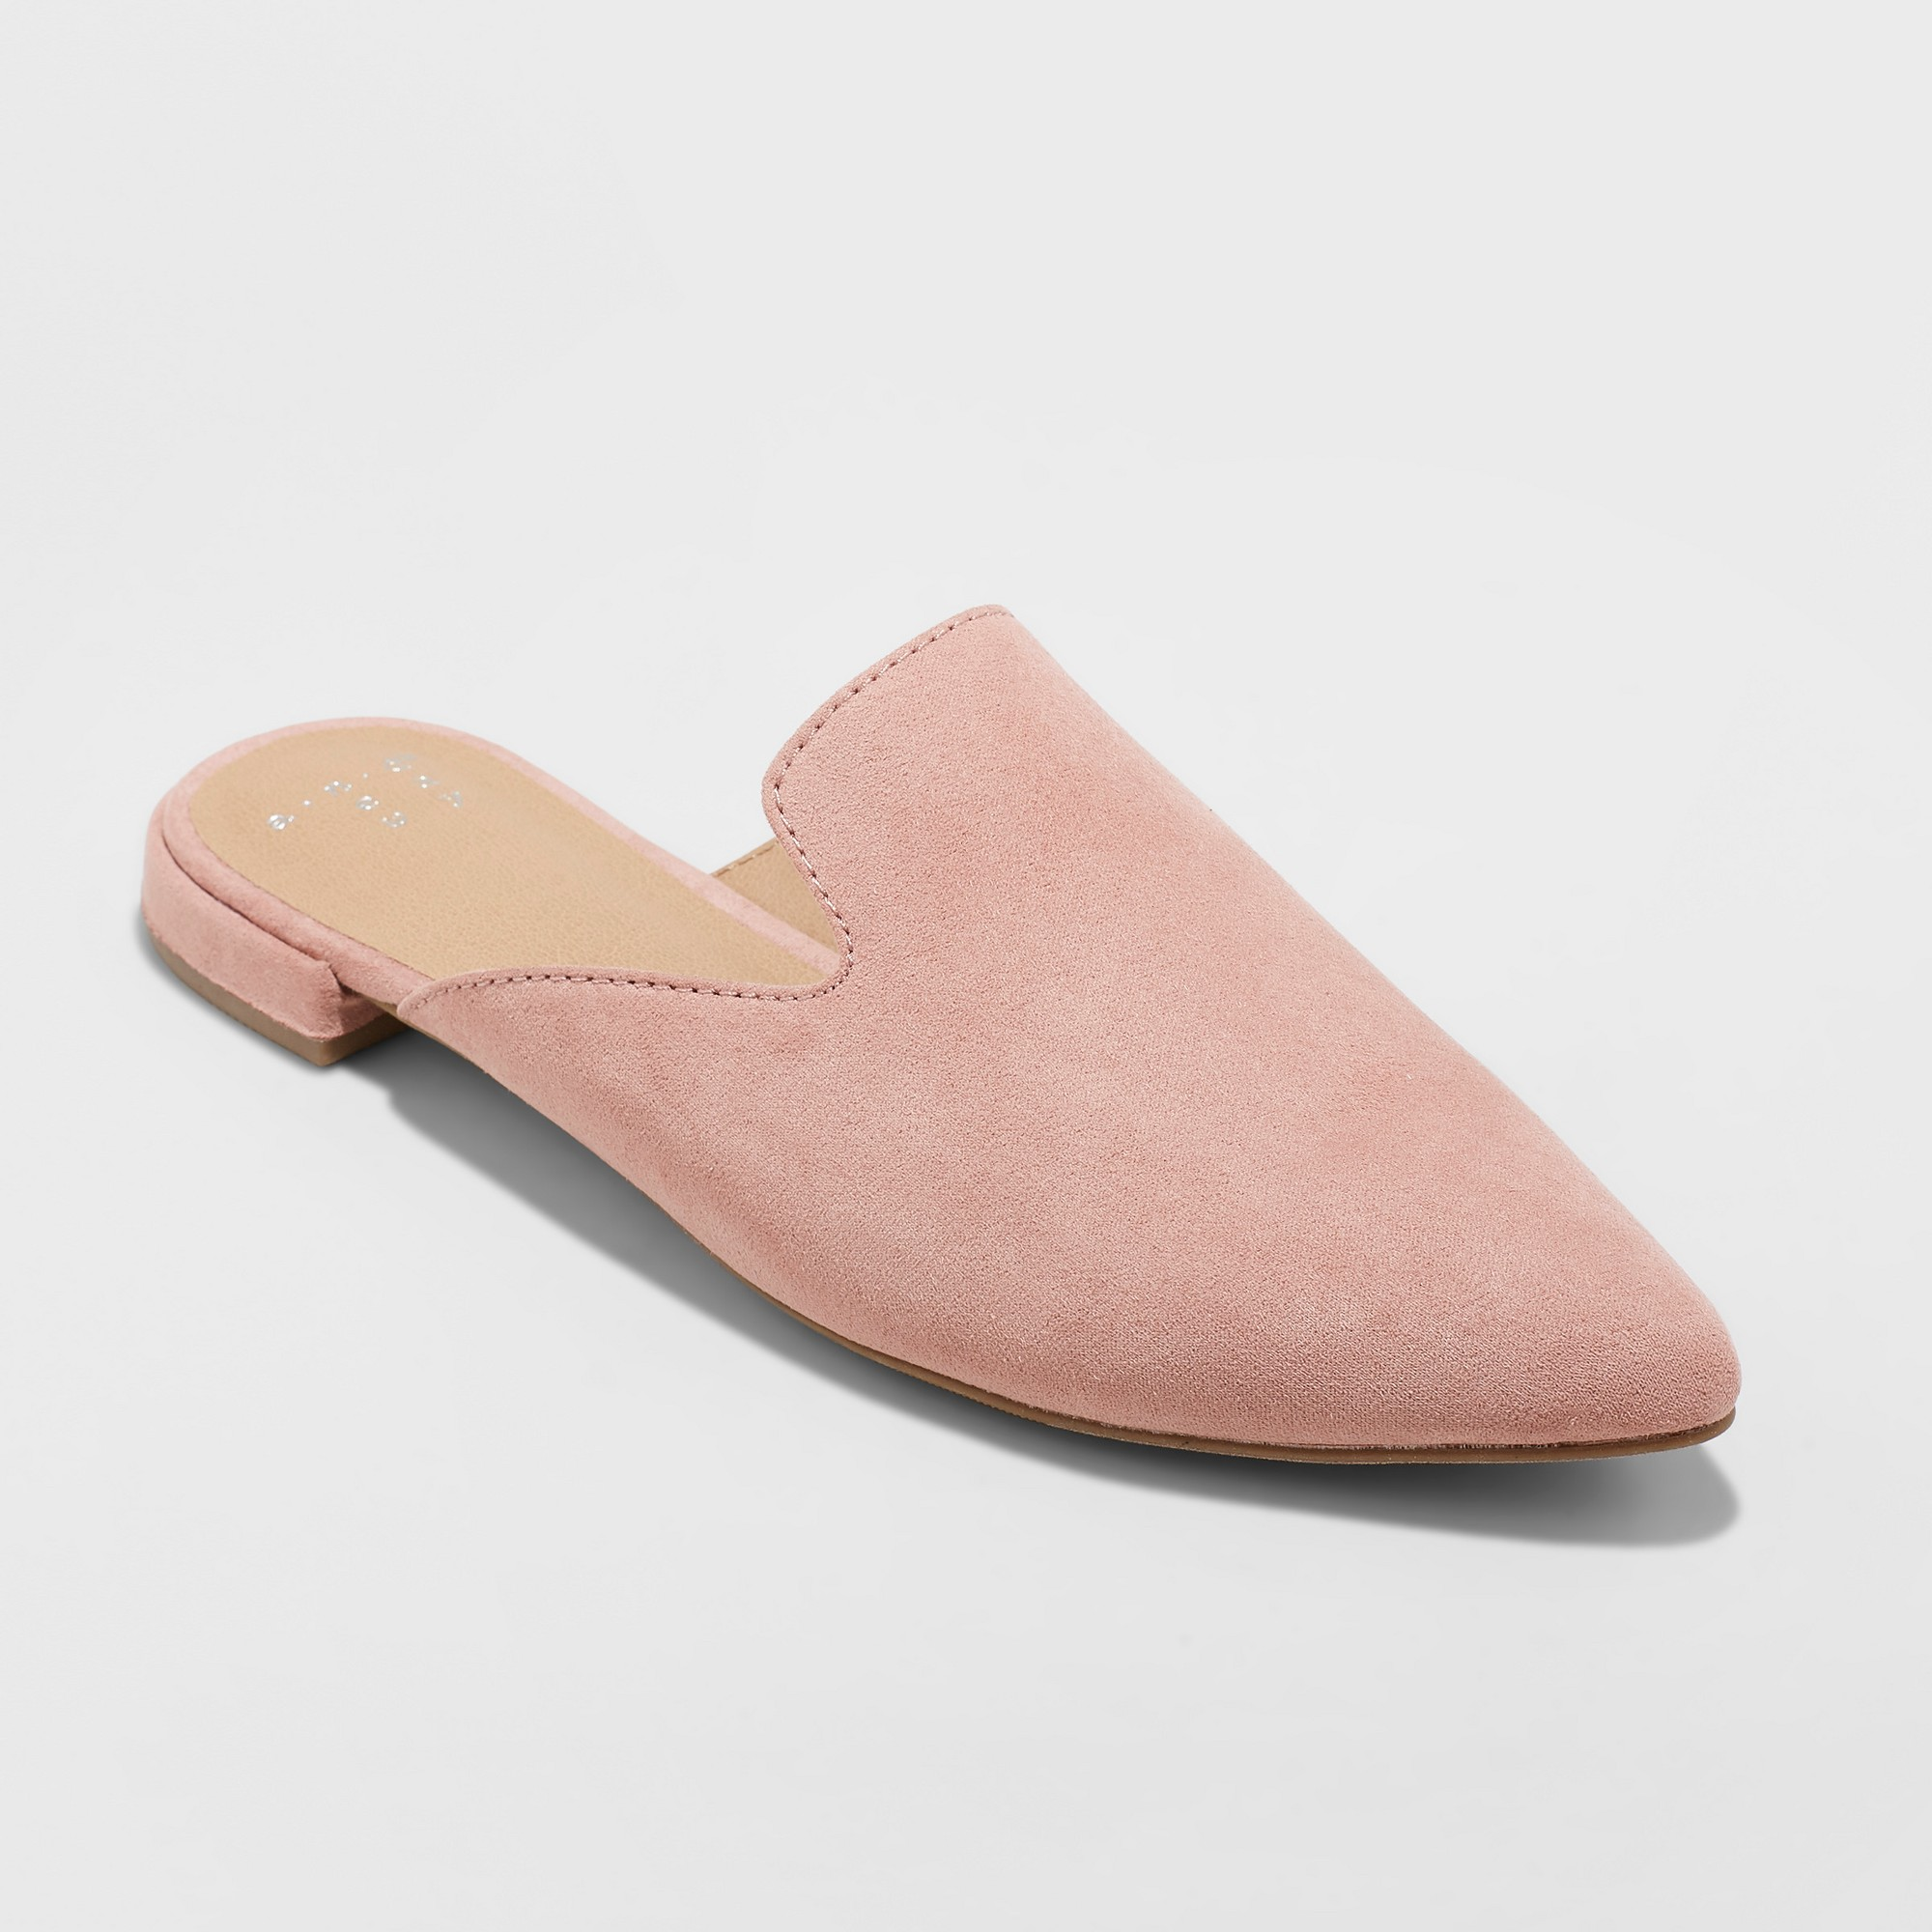 Women's Velma Wide Width Slip On Pointy Toe Mules - A New Day Pink 8.5W, Size: 8.5 Wide